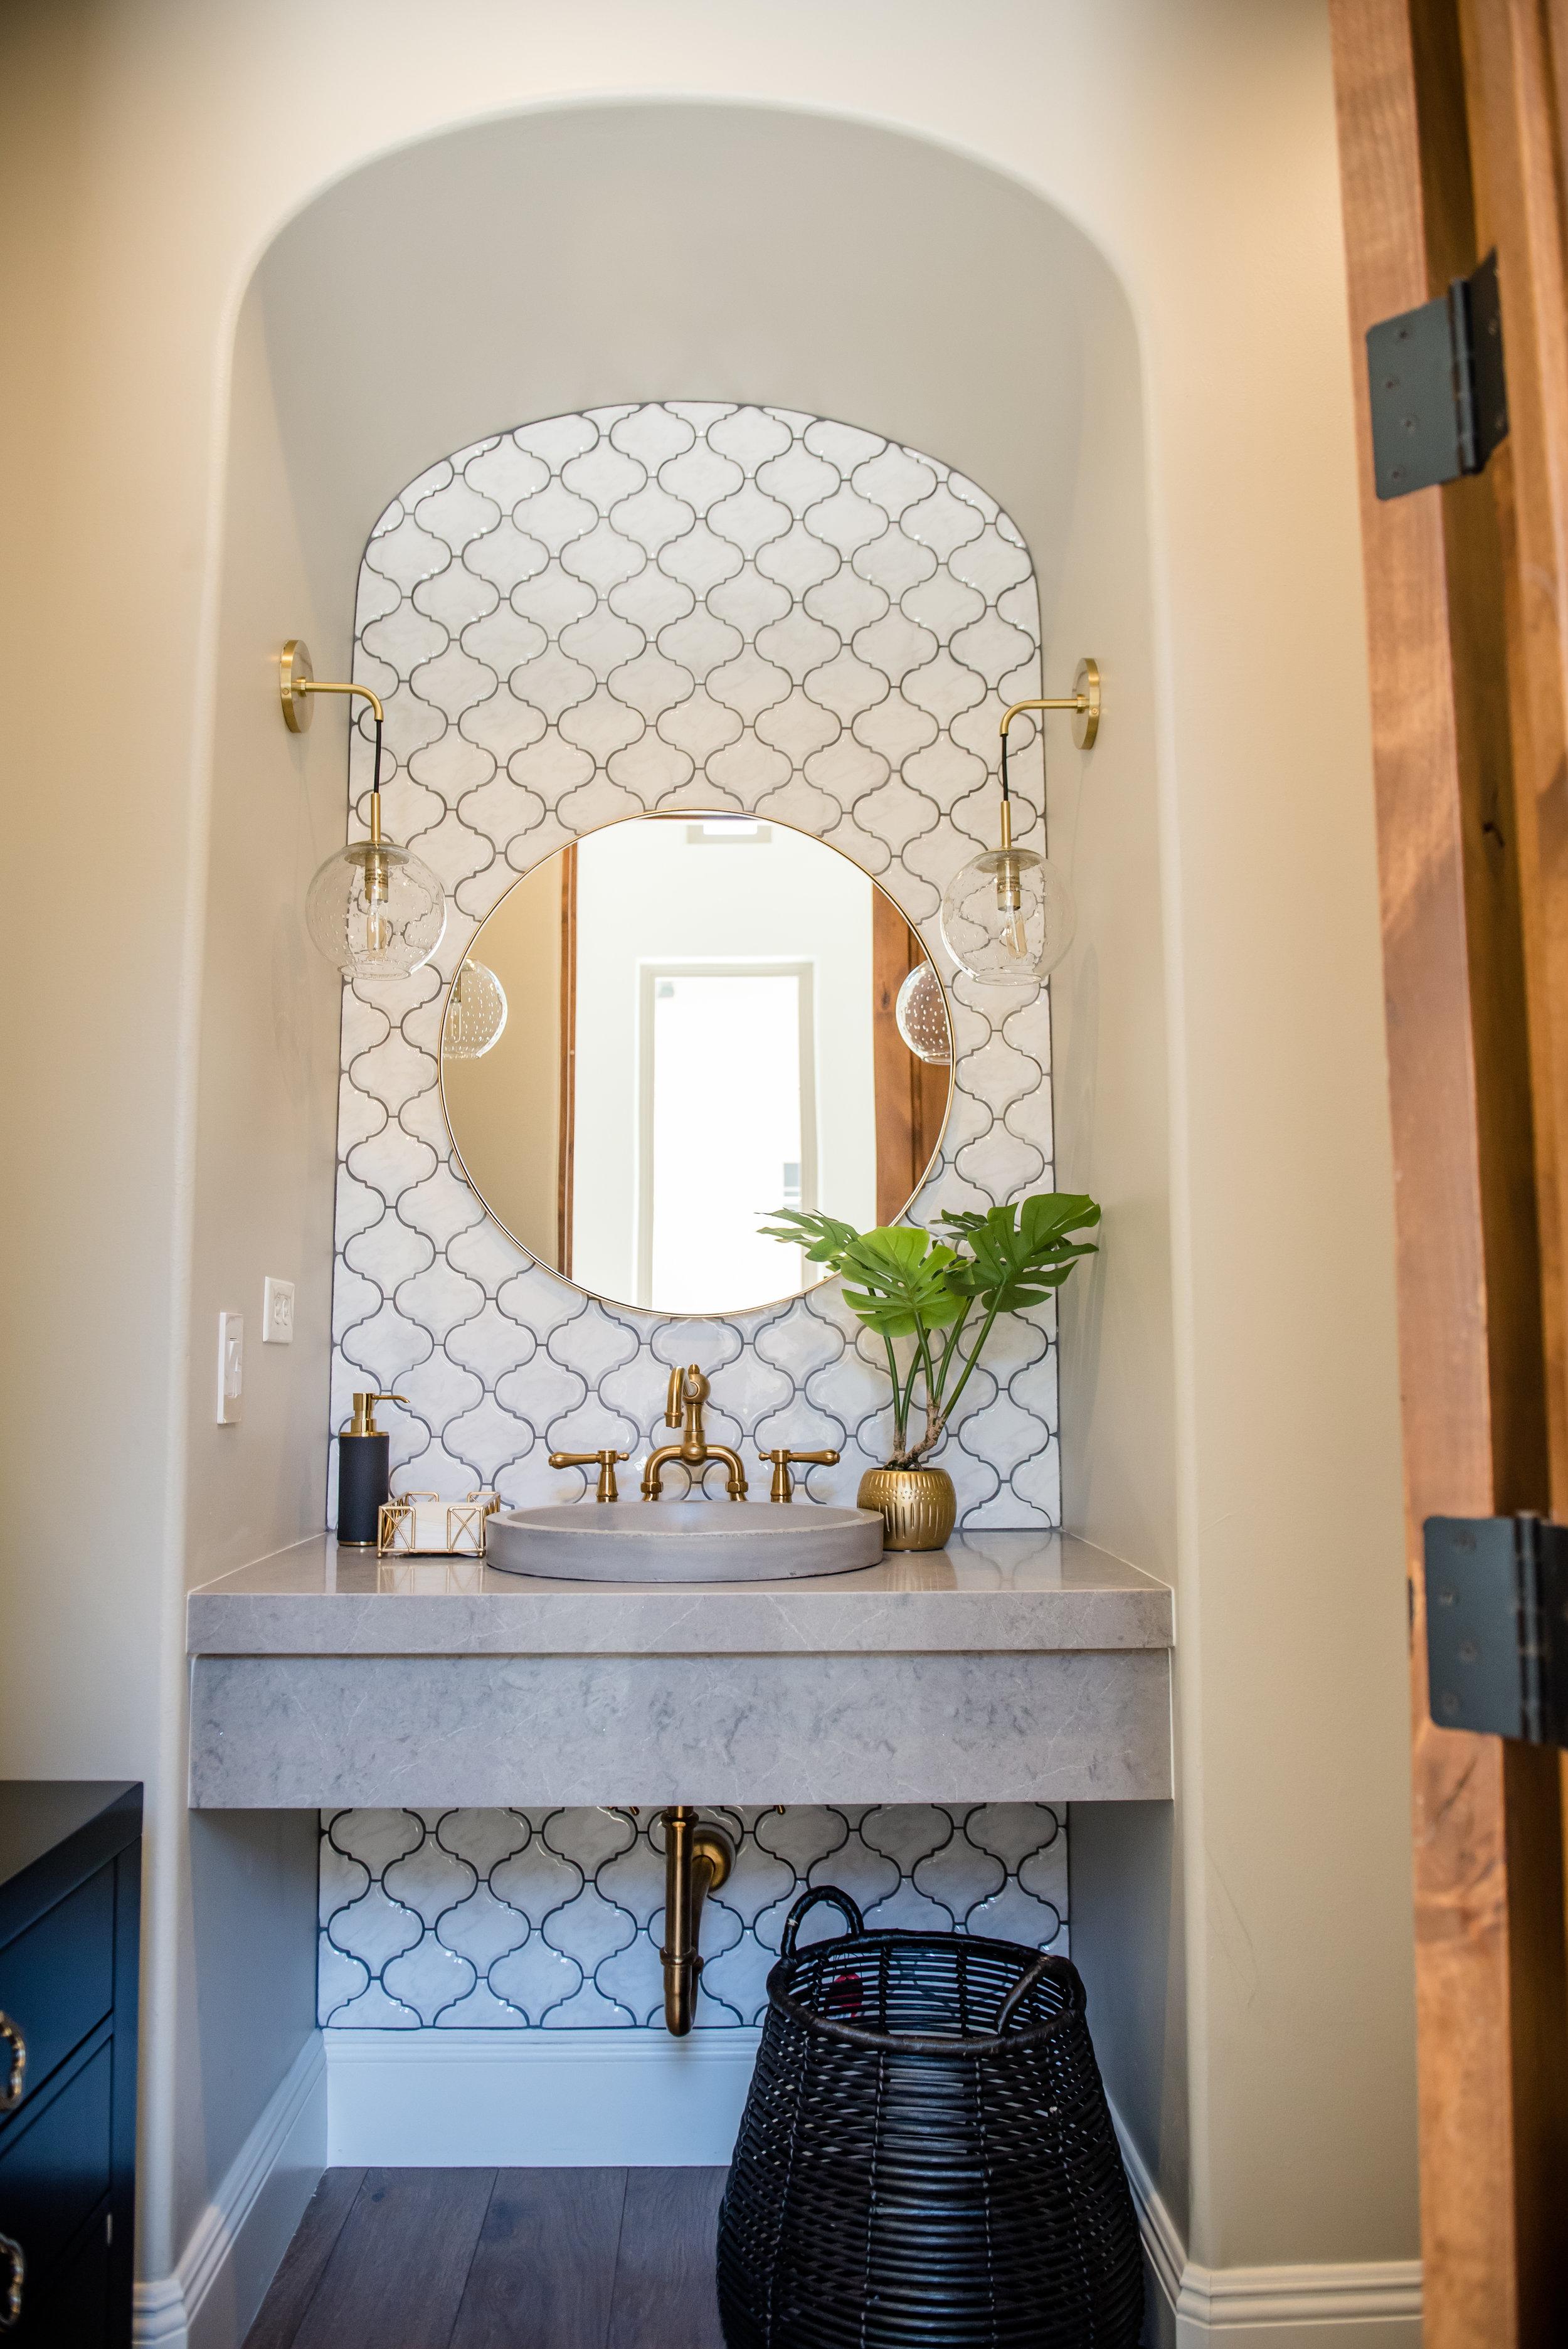 41+powderbath+tile+arabesque+brass+lighting+bohostyle.jpg